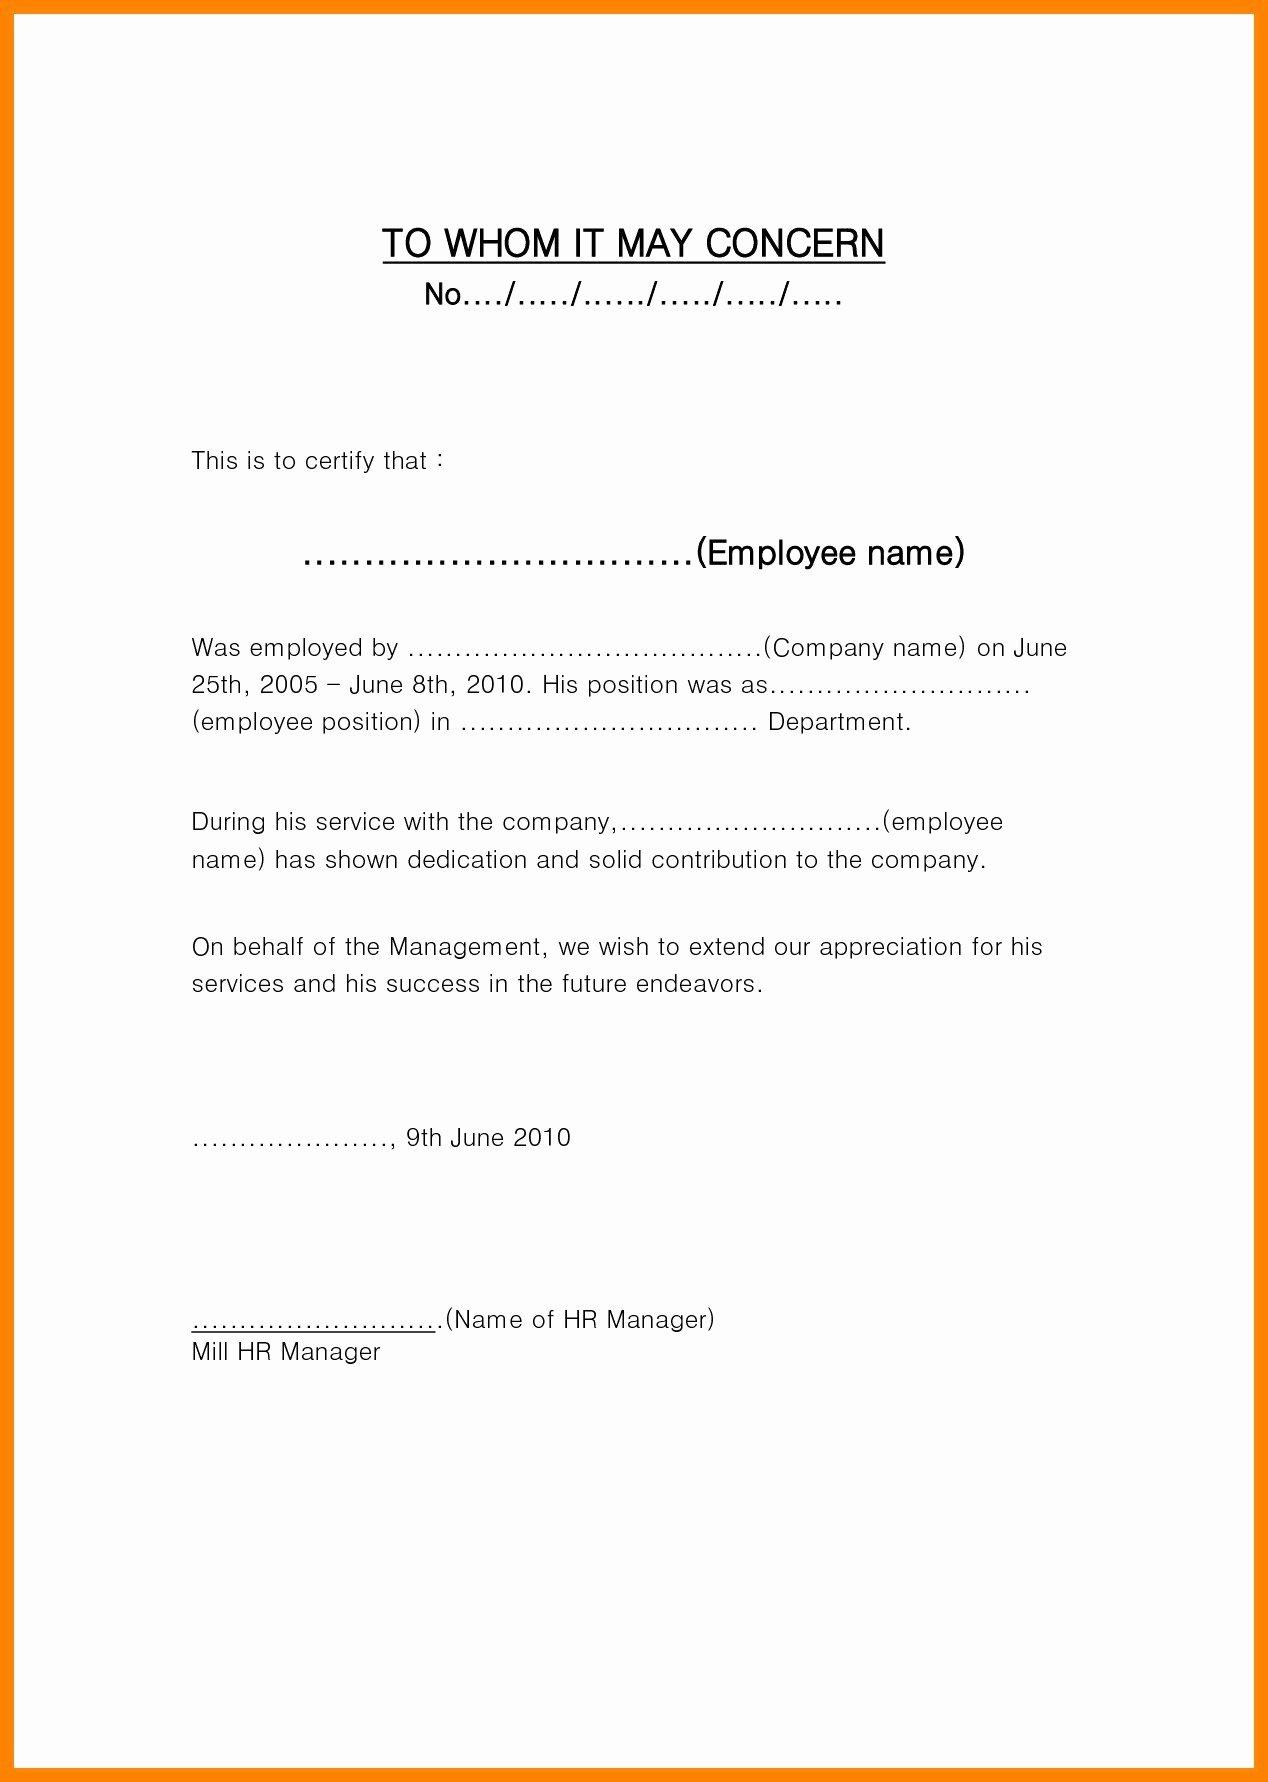 Employment Verification Letter Template Word New Employment Verification Letter to whom It May Concern